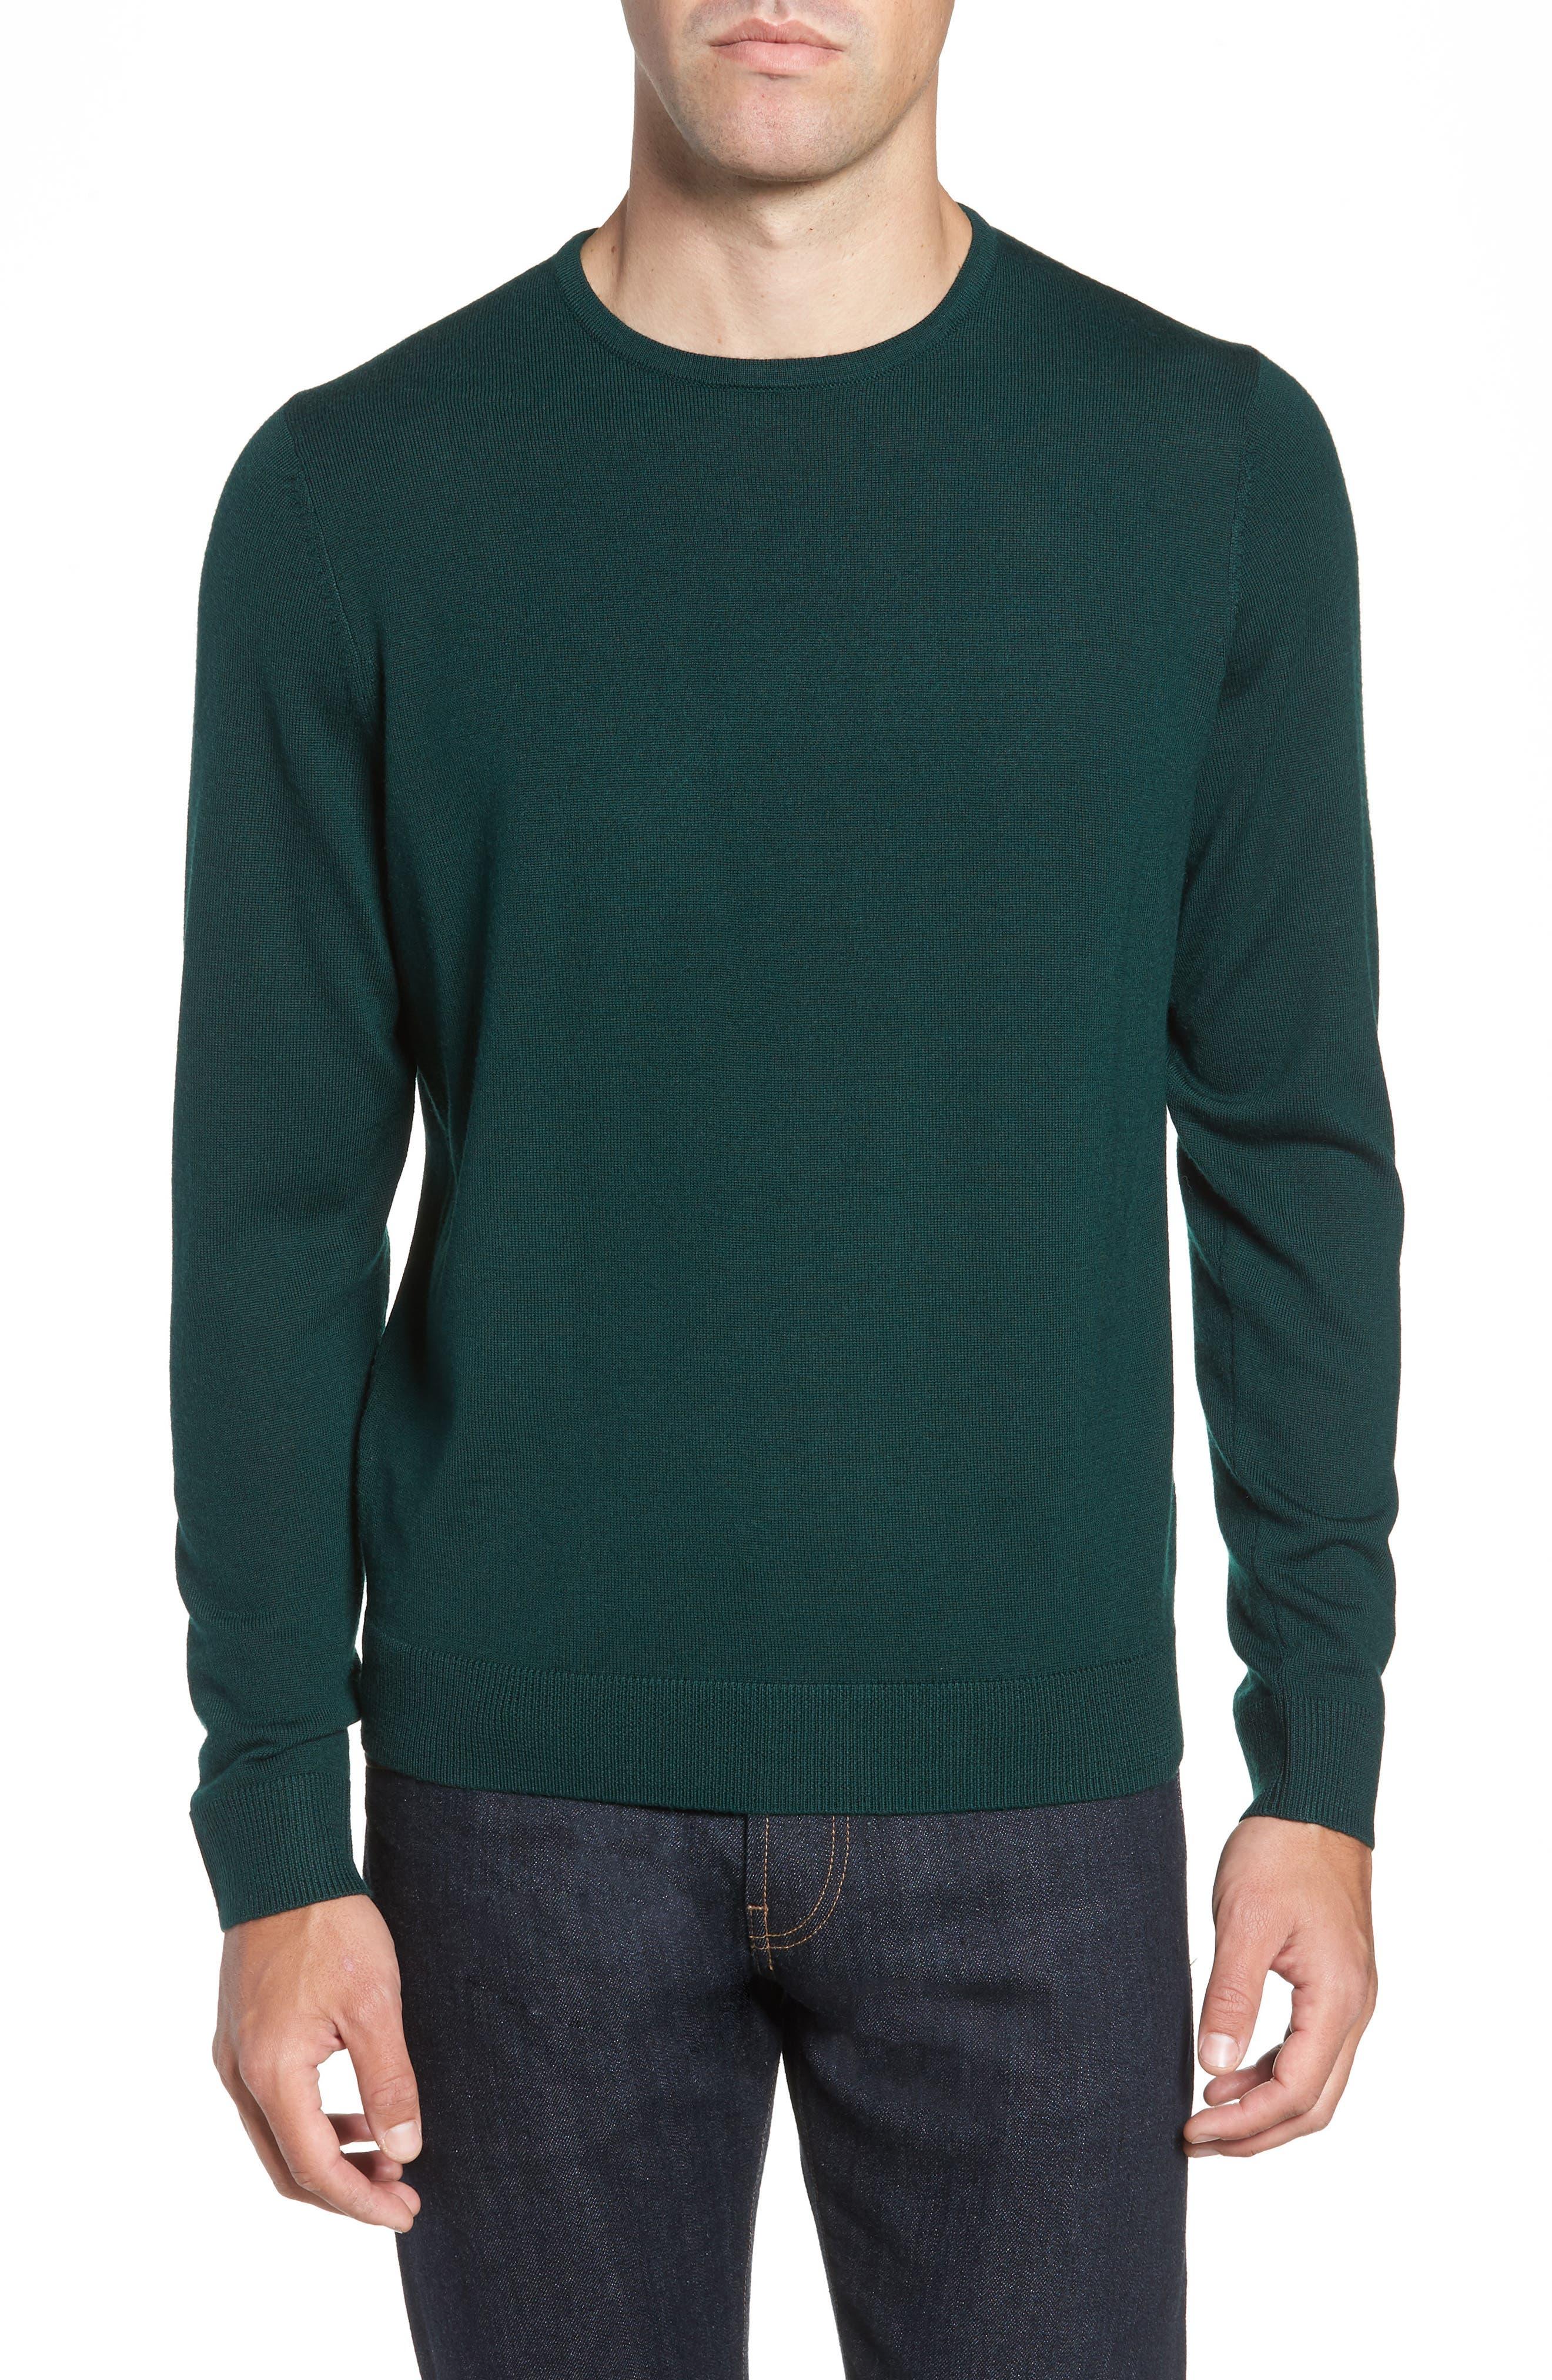 Nordstrom Shop Crewneck Merino Wool Sweater, Green